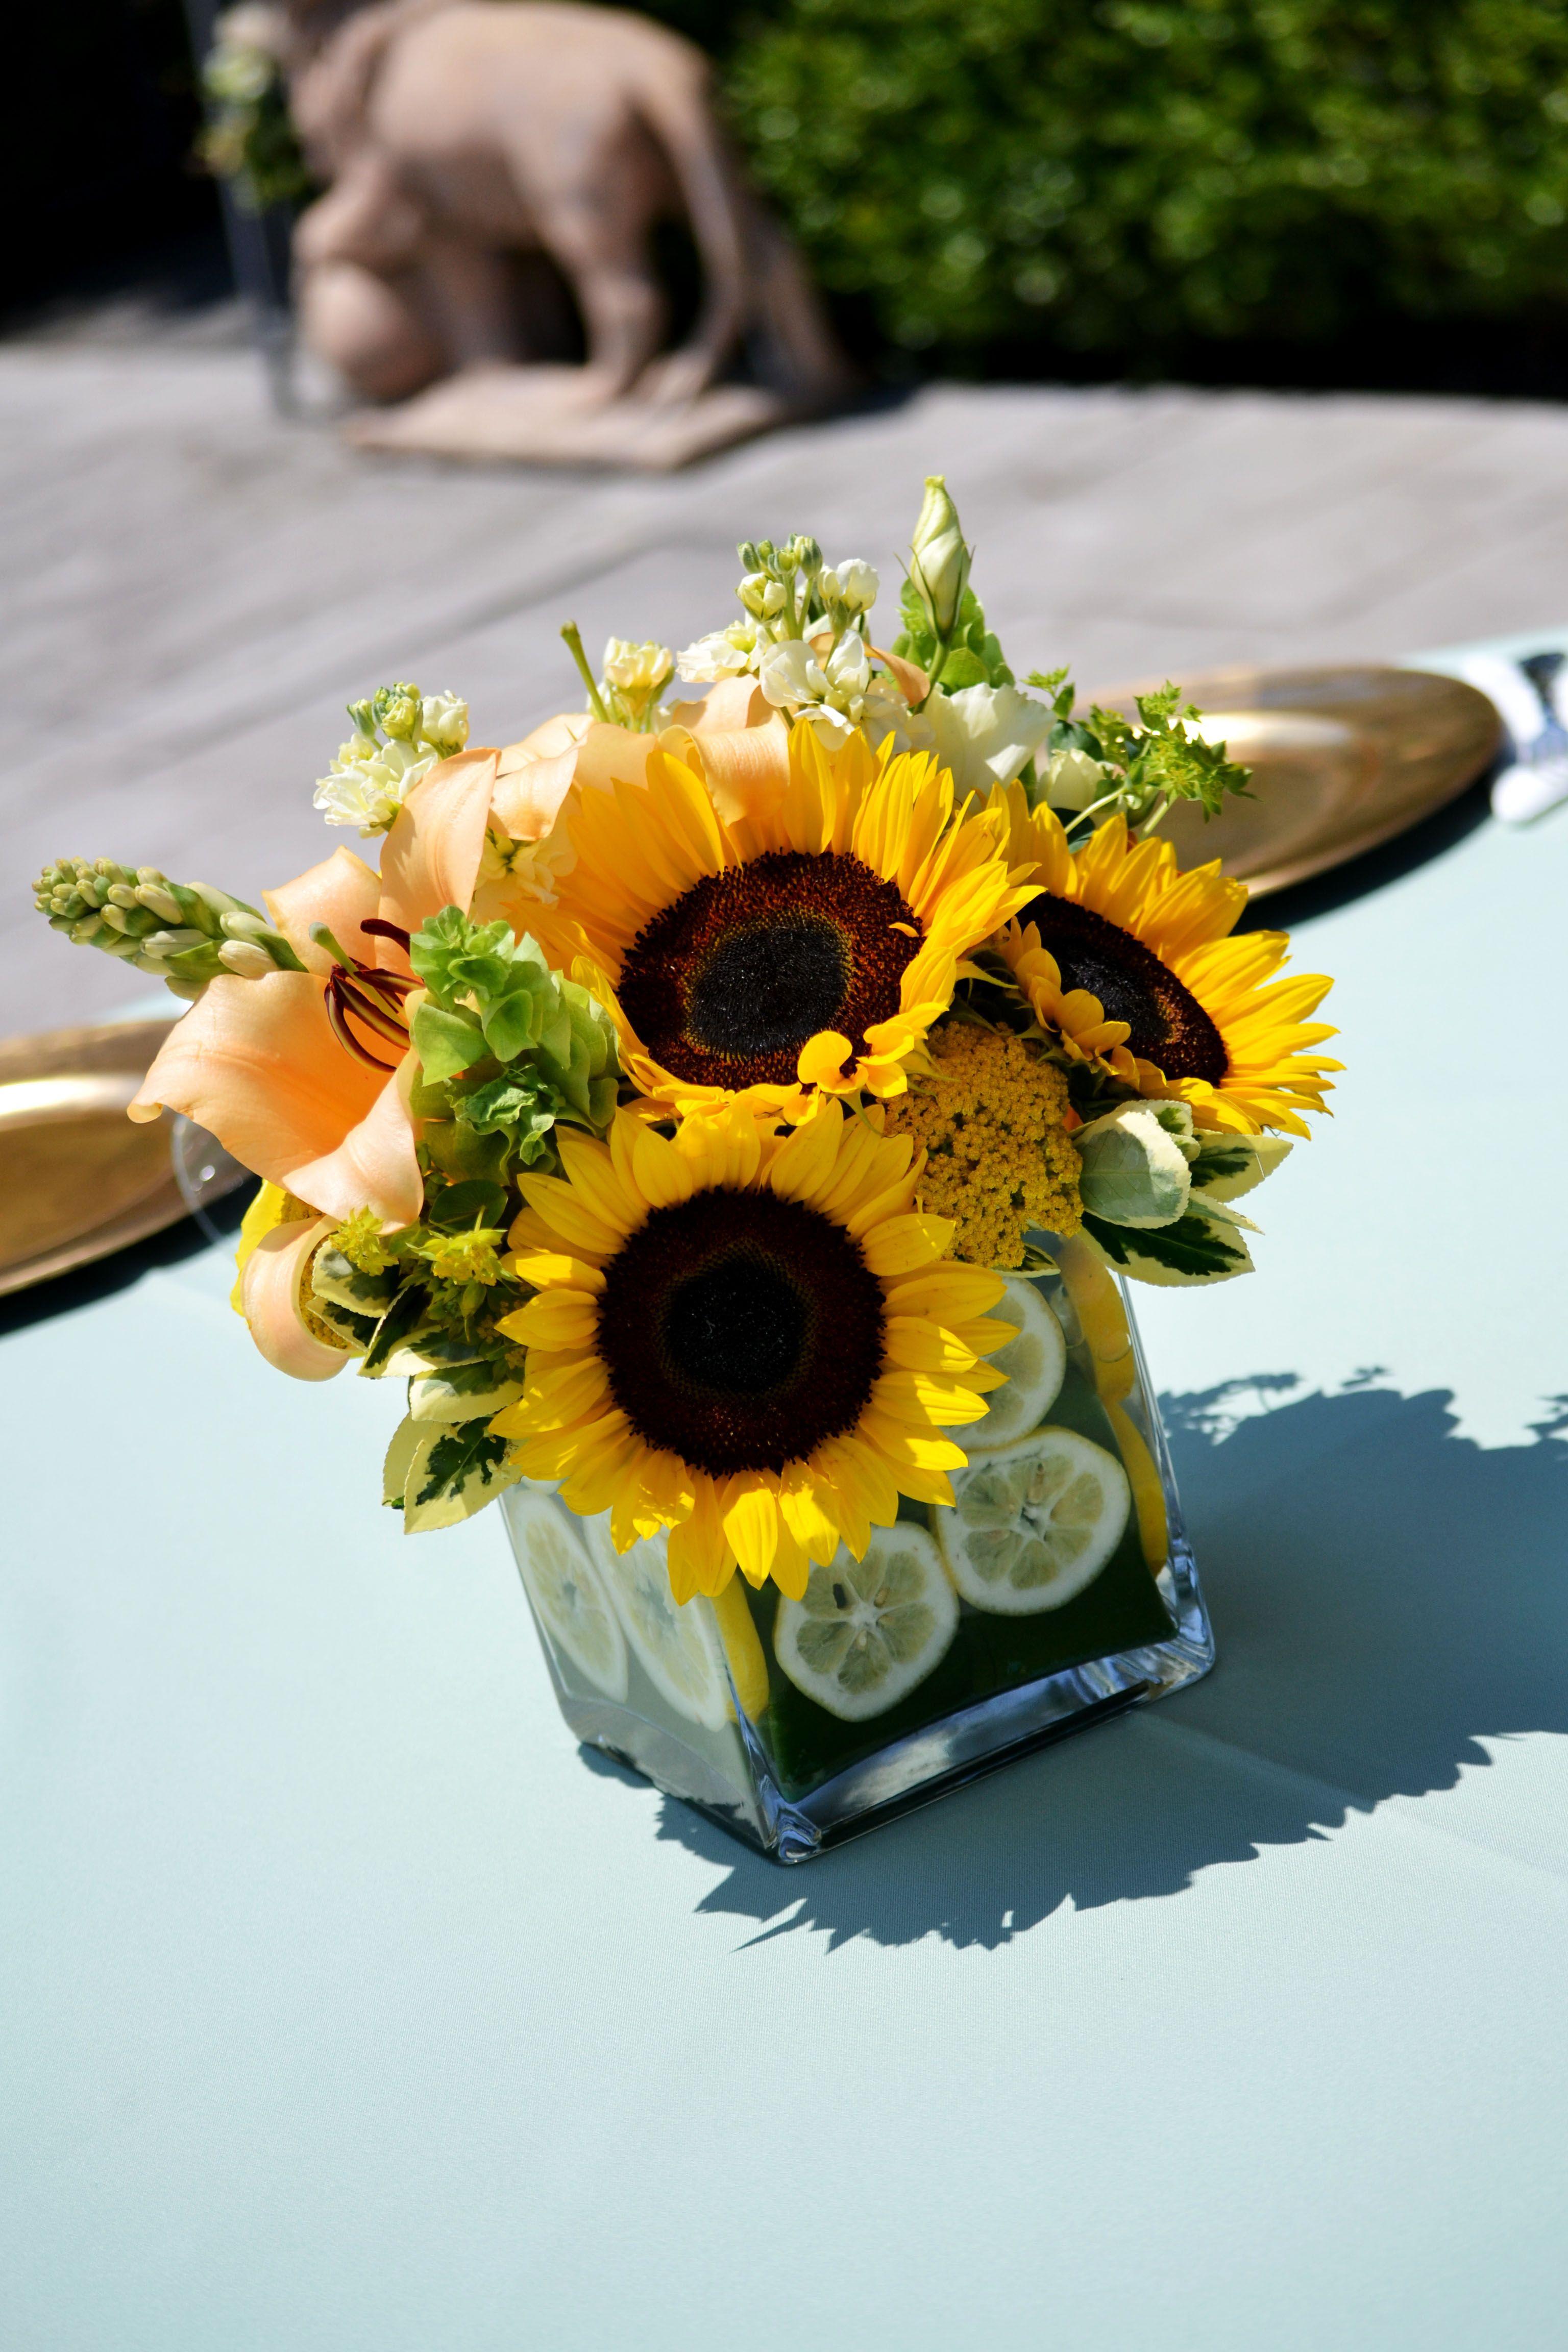 Pin By Eren Villa Deleon On Party Ideas Sunflower Centerpieces Sunflower Arrangements Sunflower Table Centerpieces